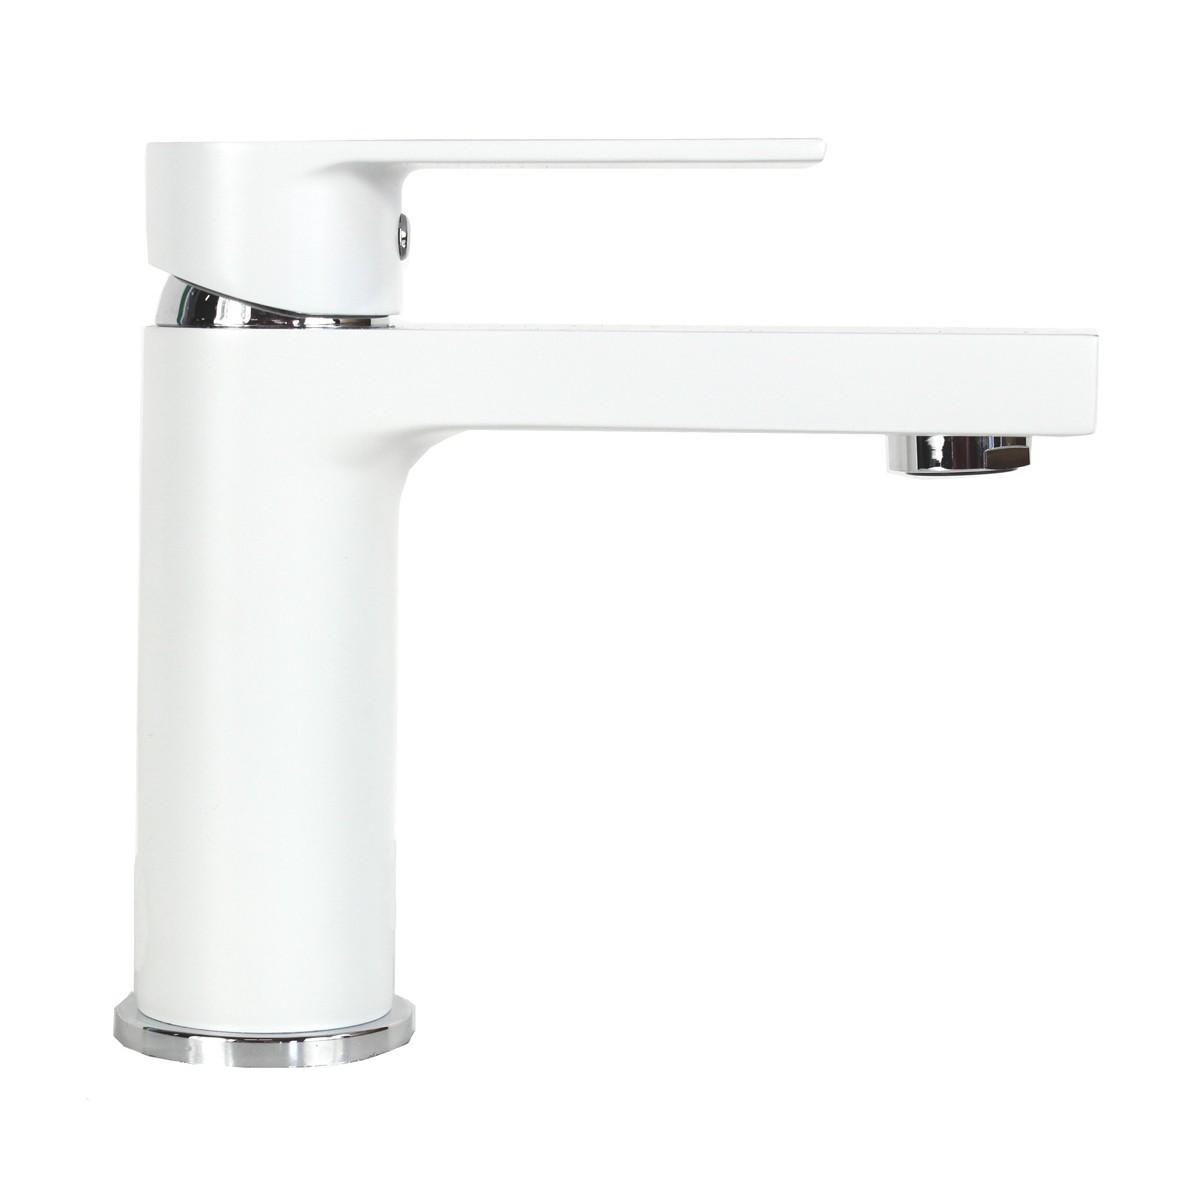 Anna Matte White Chrome Handle Bathroom Vessel Sink Single Hole Faucet